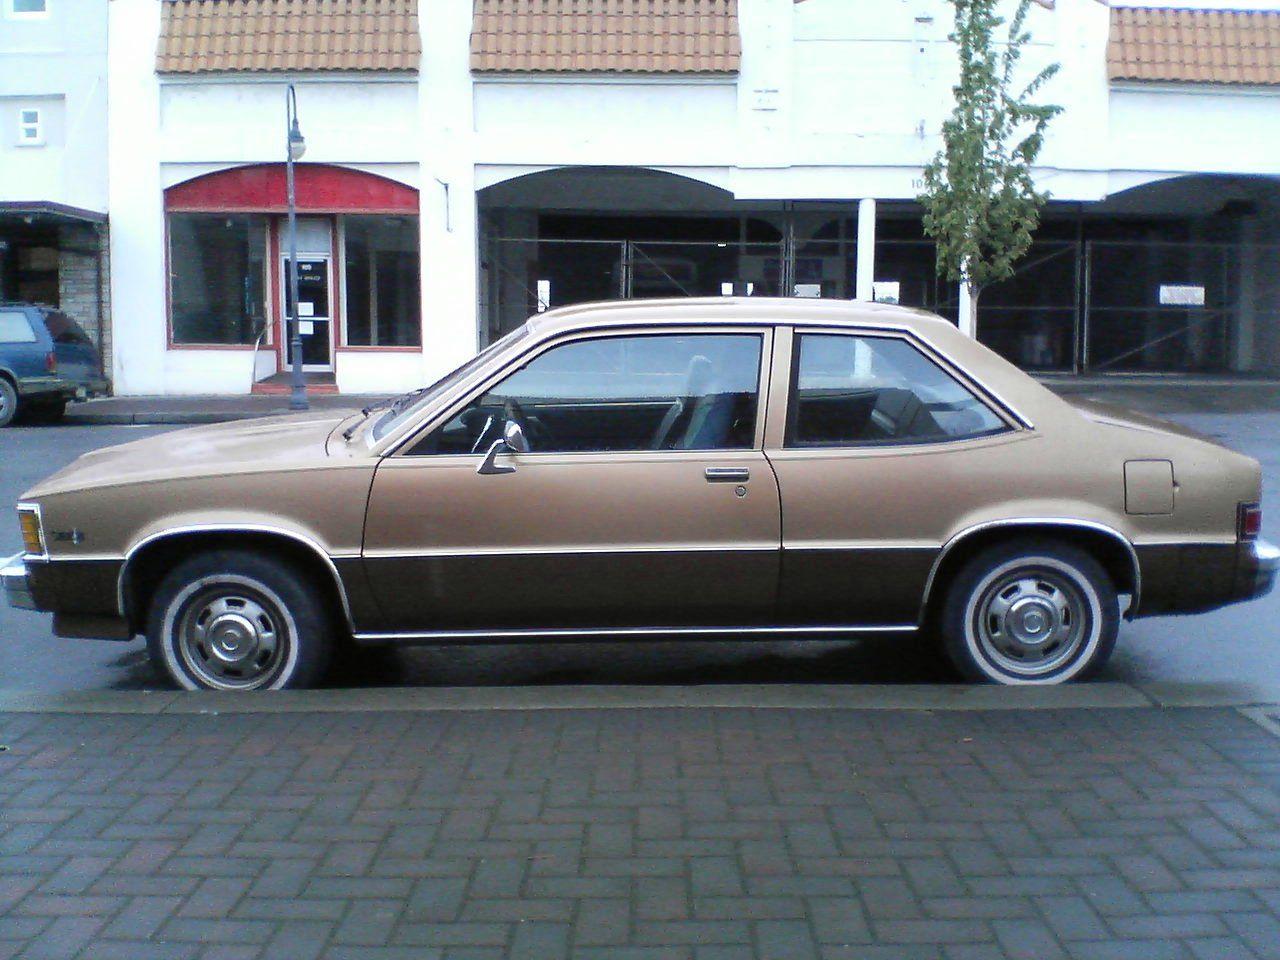 All Chevy 1985 chevrolet citation : Chevrolet Citation Club Coupe.   GM   Pinterest   Chevrolet, Cars ...